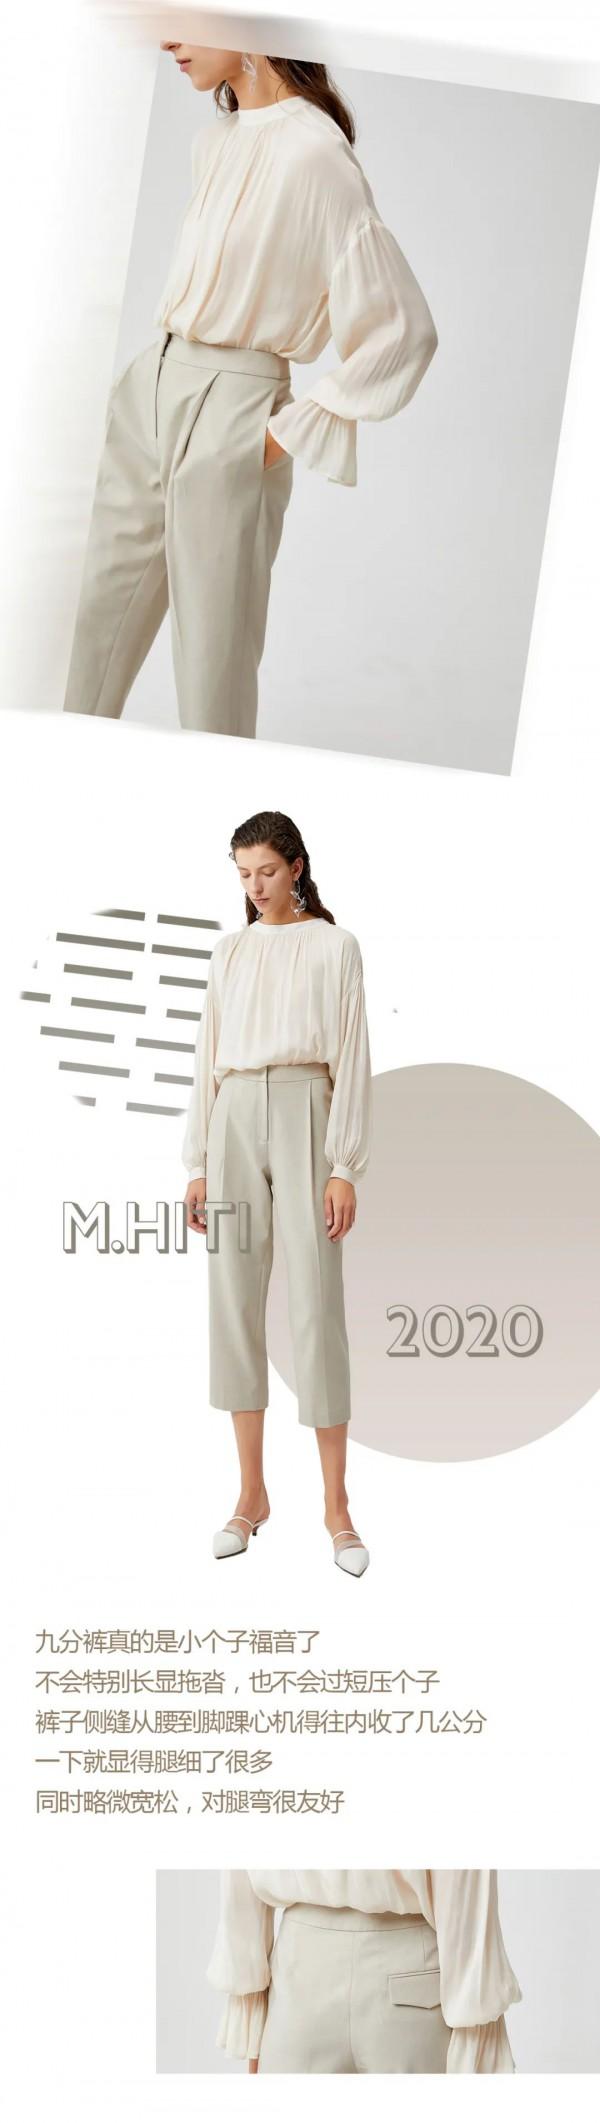 MYMO & M.HITI | 选对裤型,人人都有大长腿!